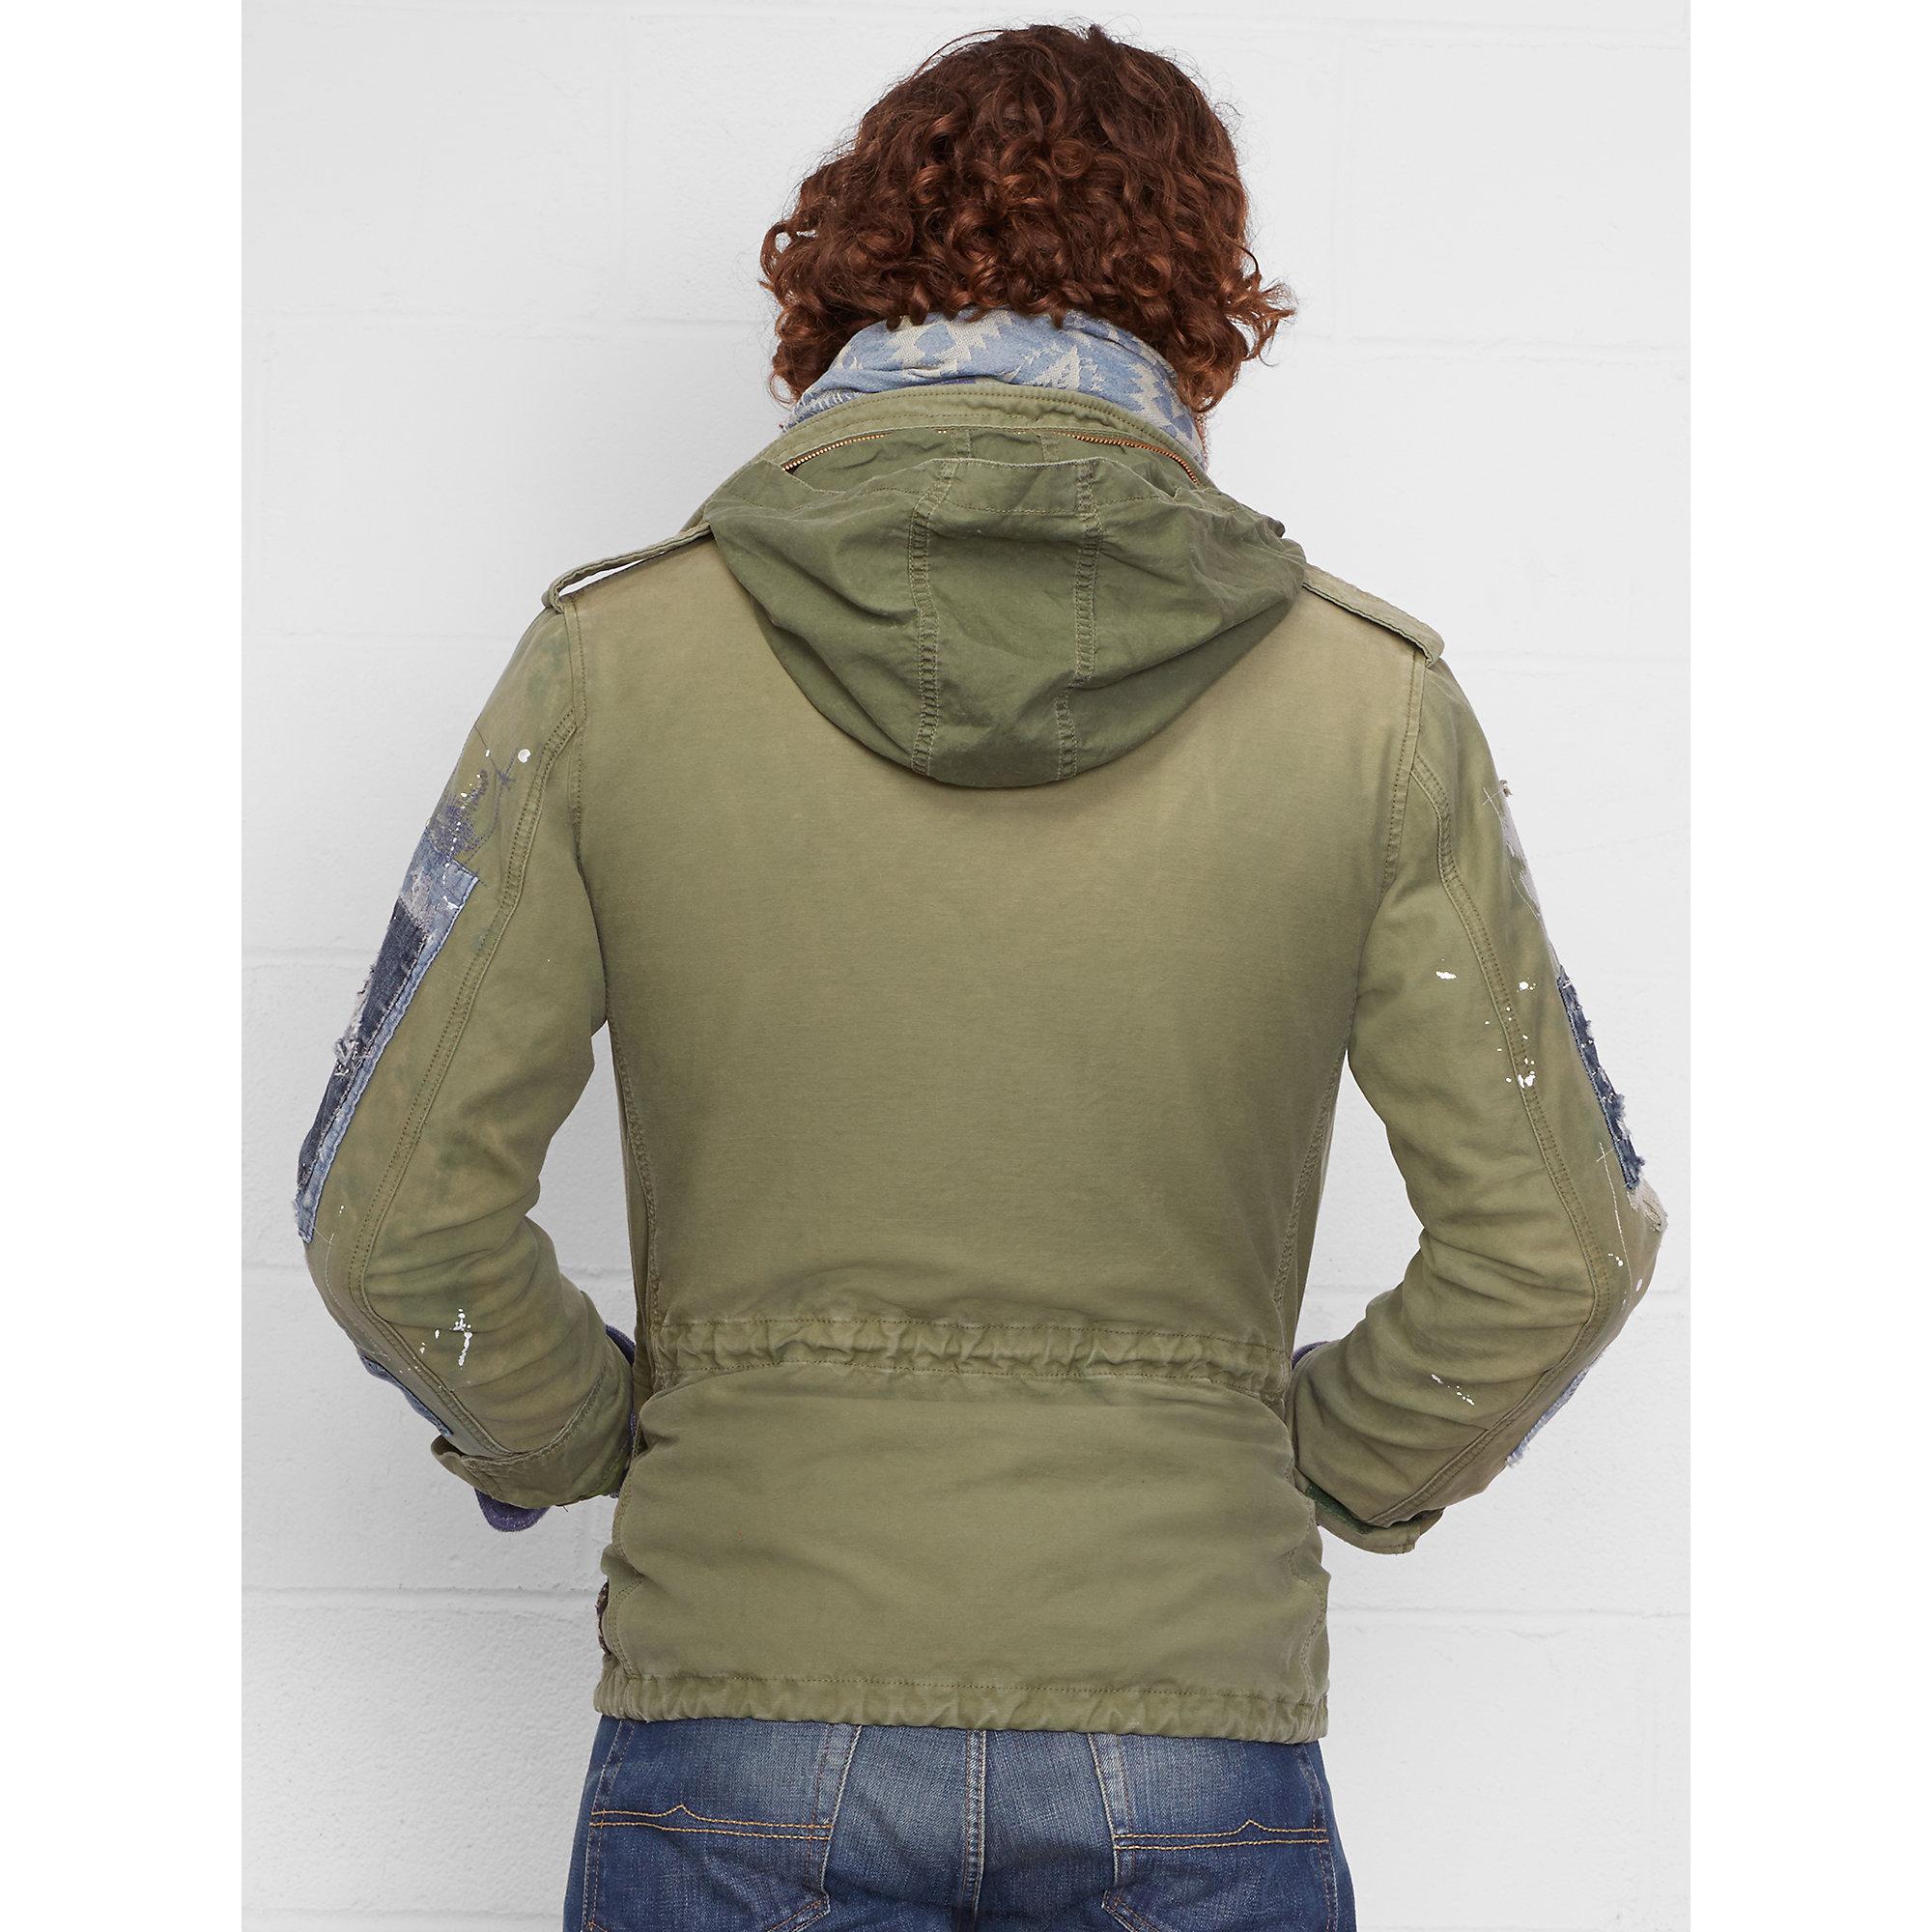 moncler jacket repair nyc